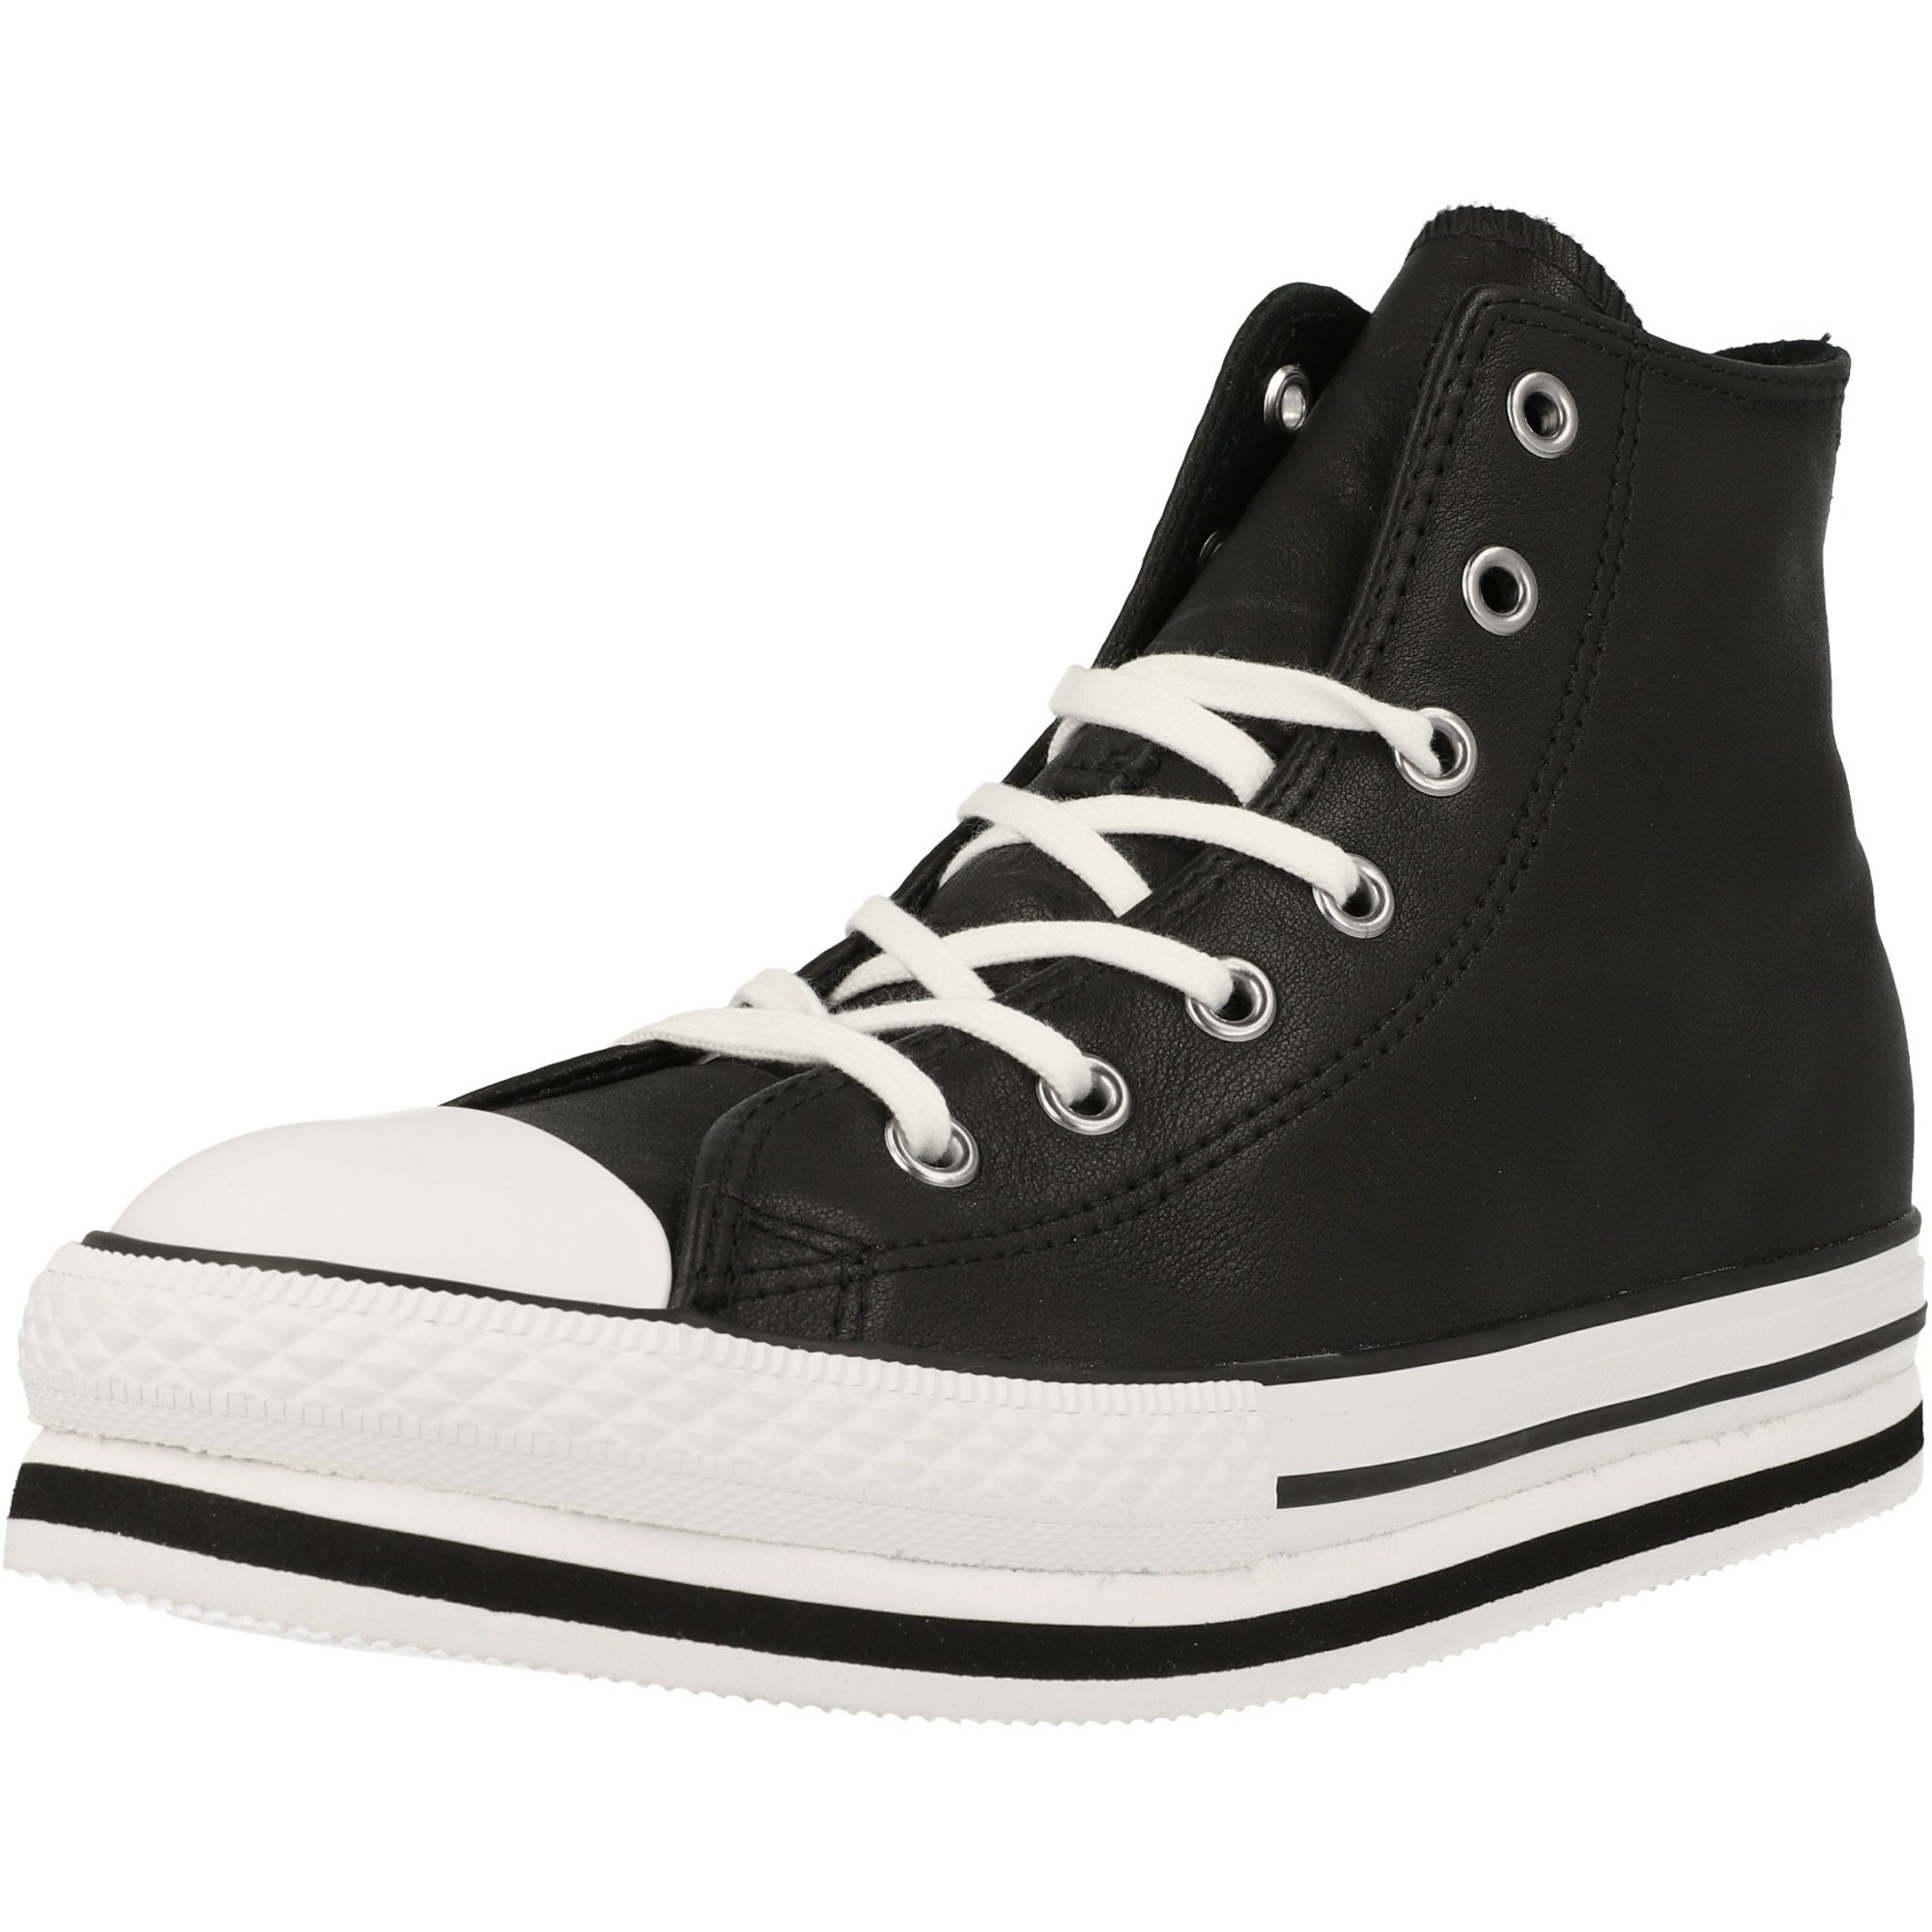 Converse Chuck Taylor All Star Platform EVA Hi Black/White Leather Youth